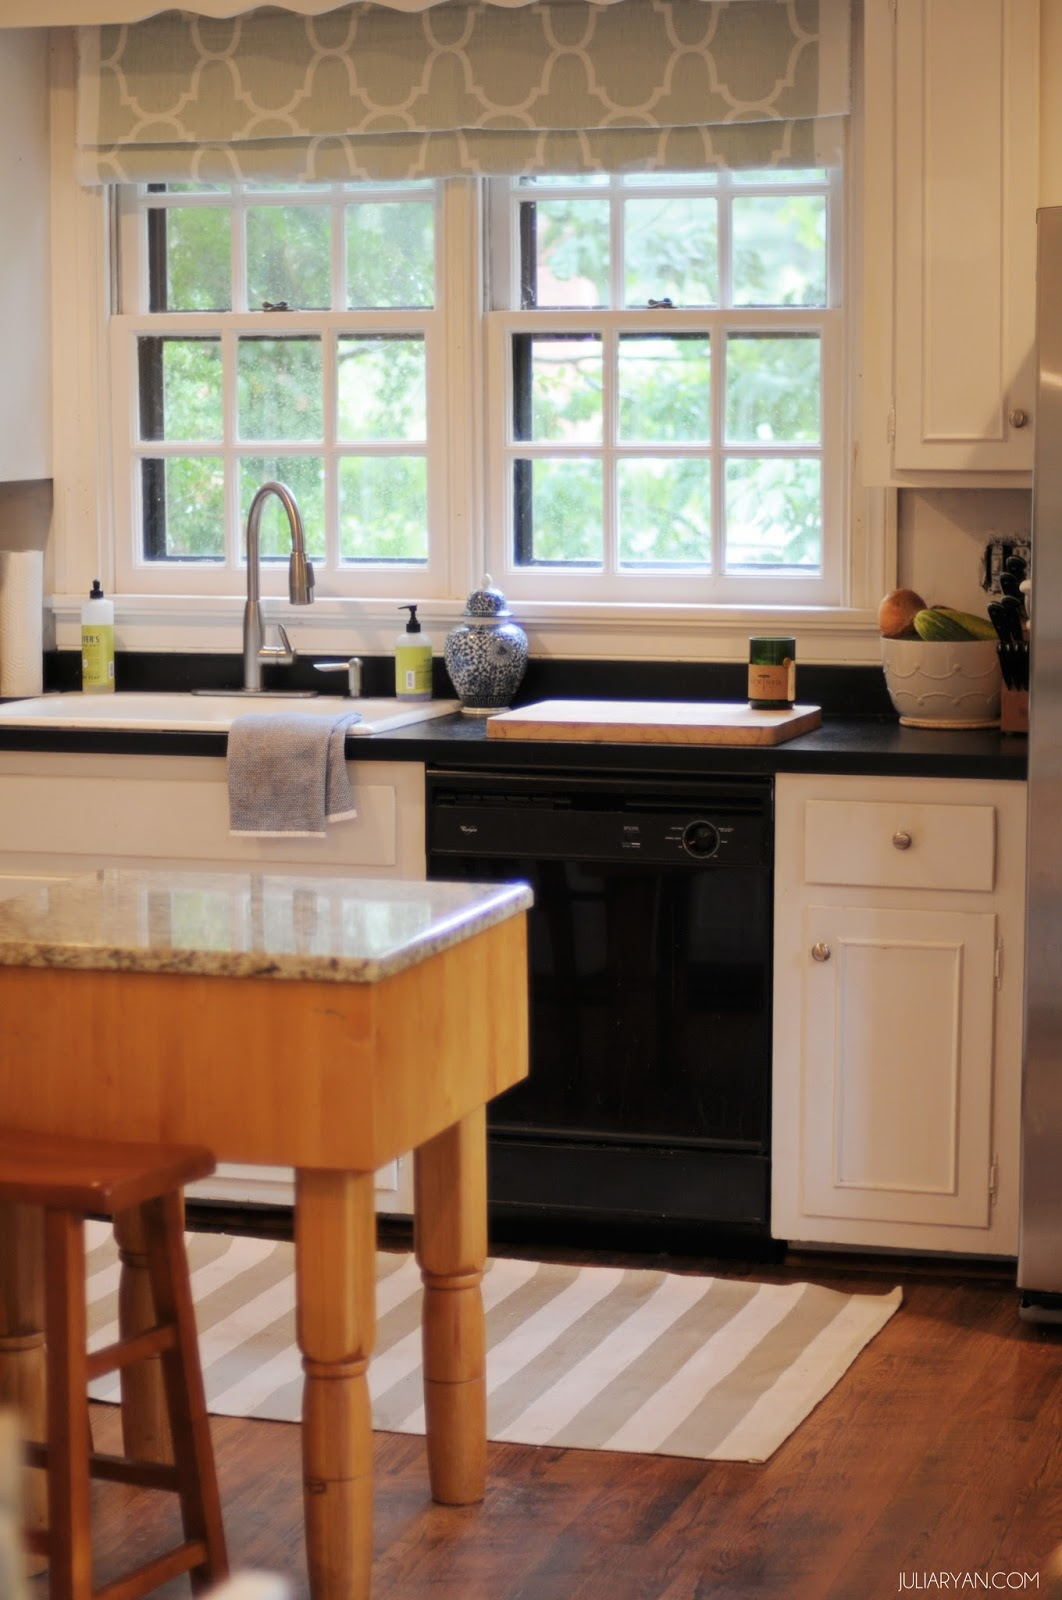 New House Progress: Kitchen Window Treatments